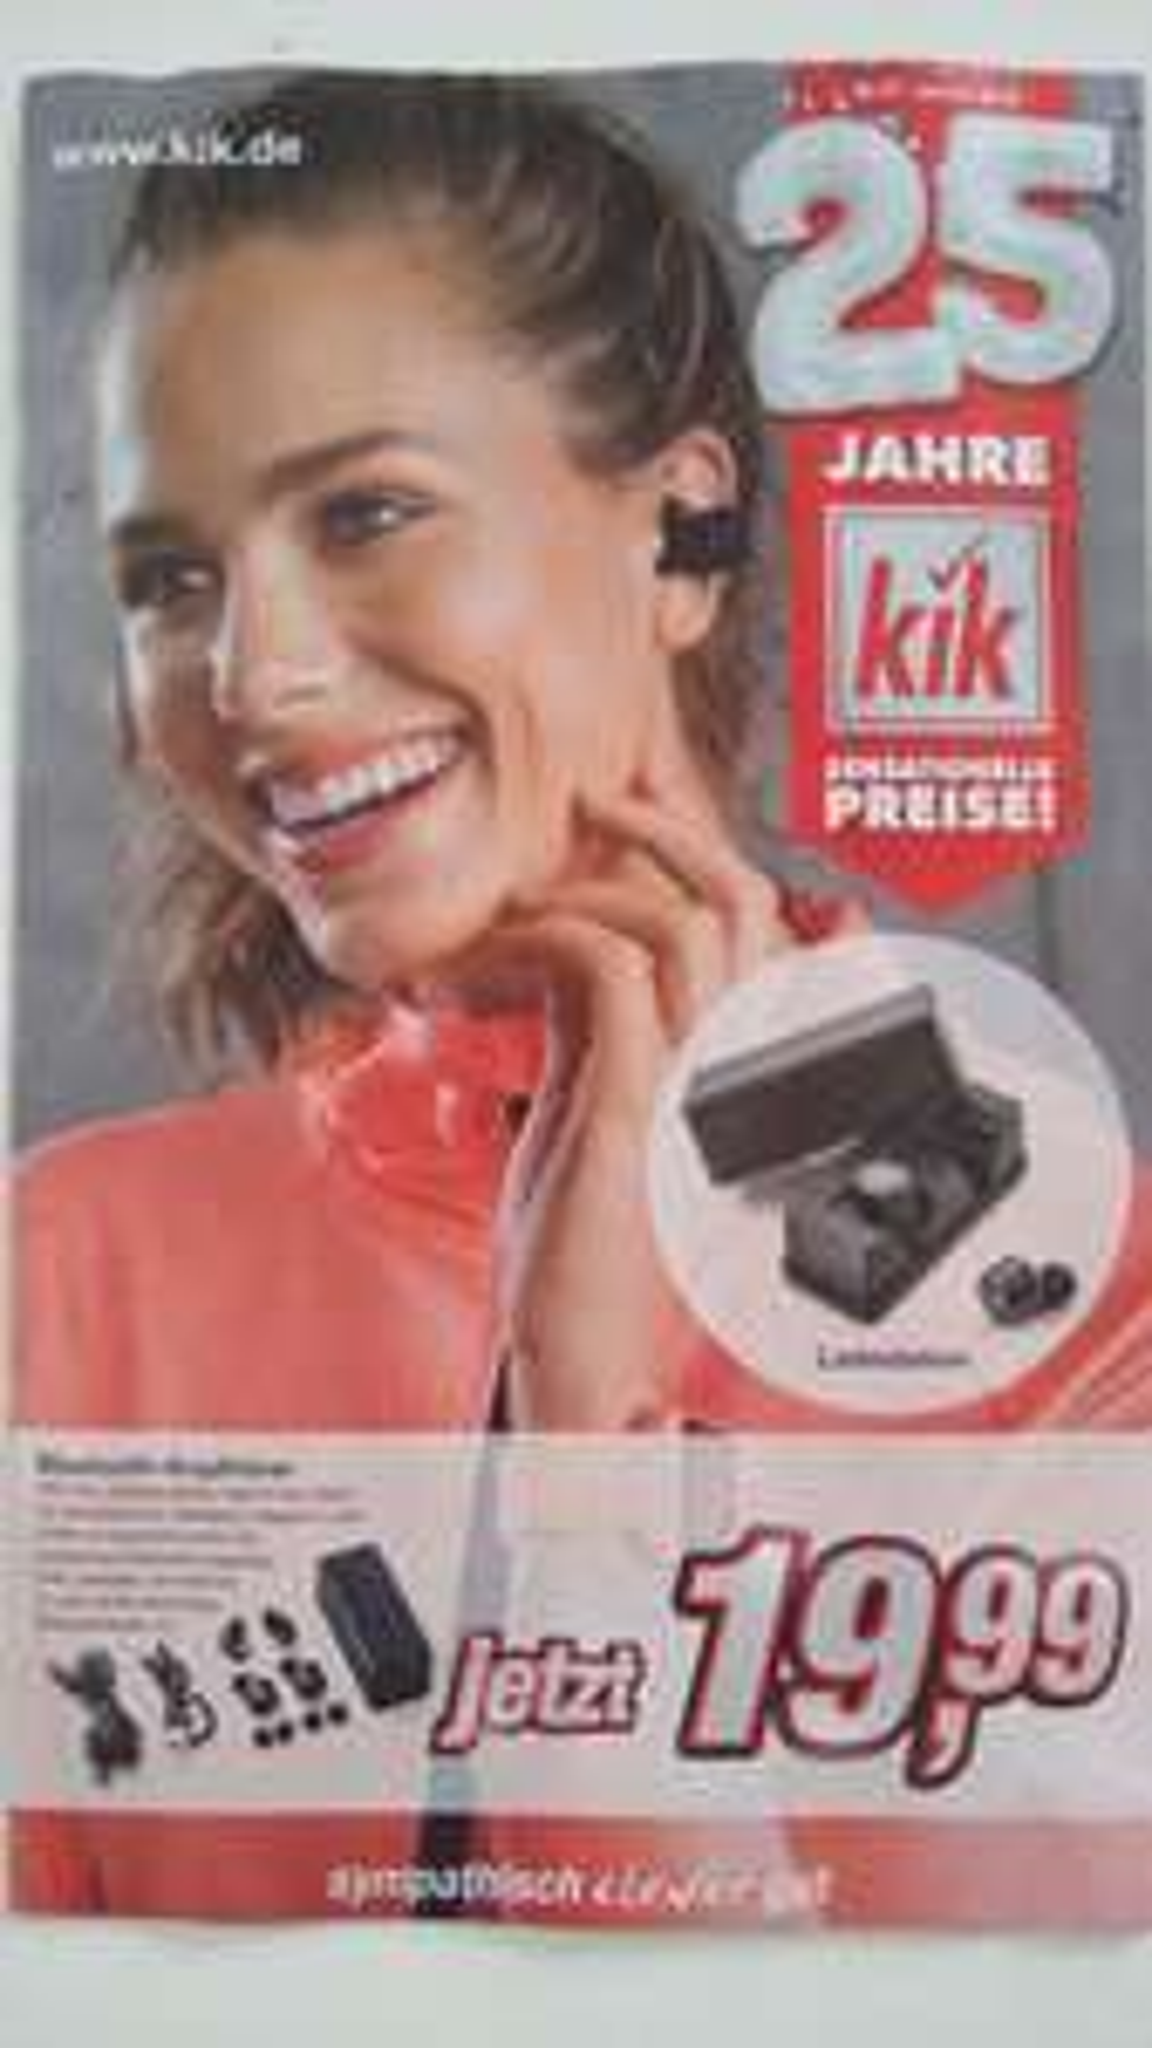 Bluetooth Kopfhörer bei kik